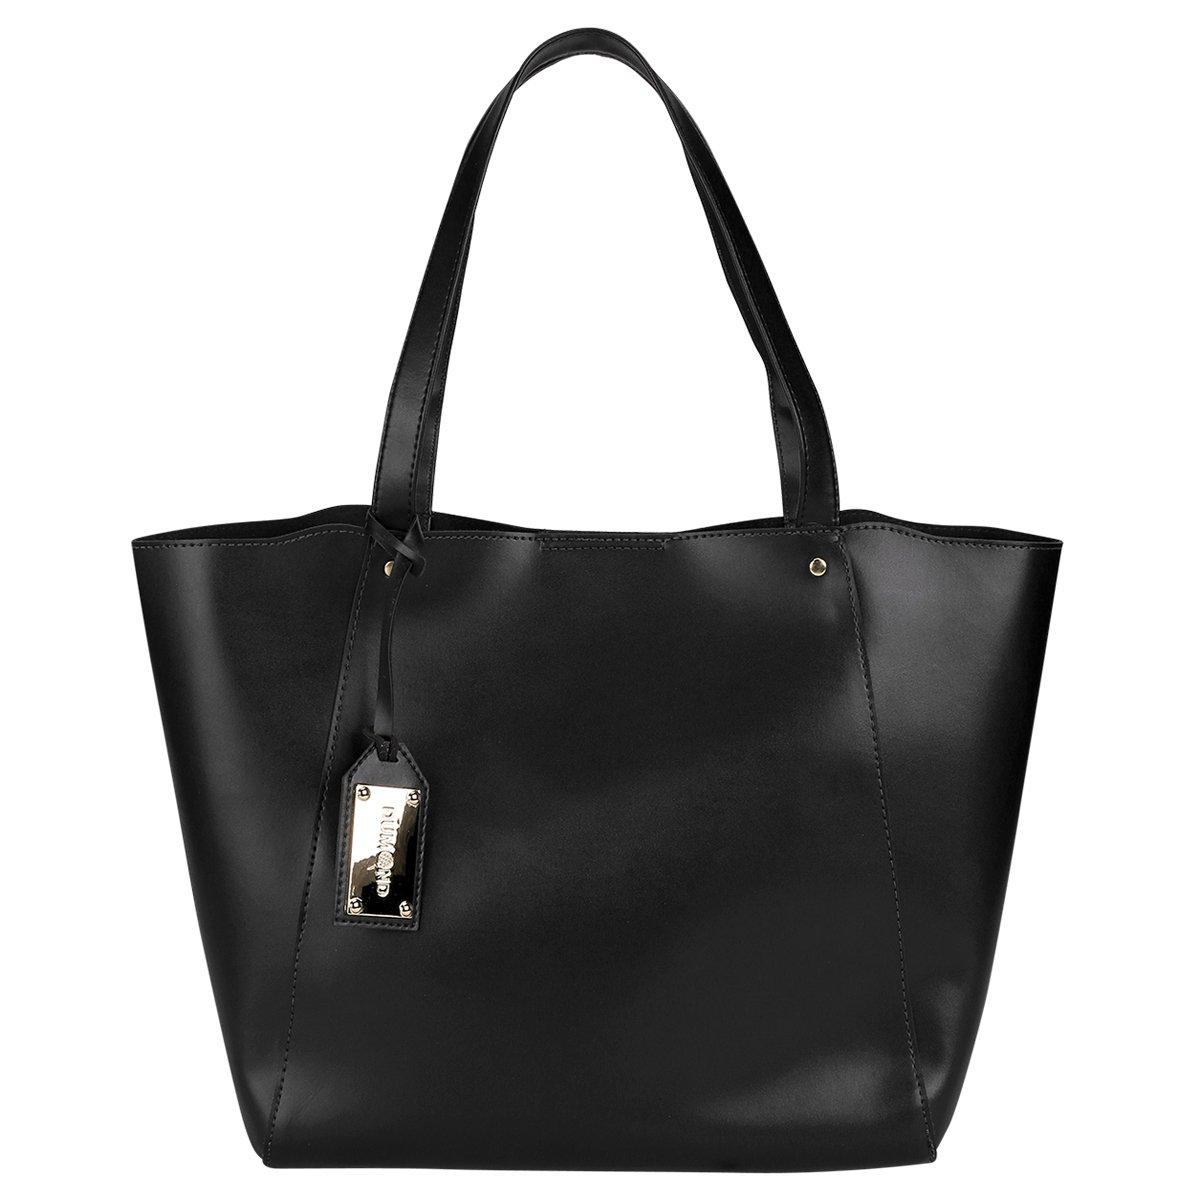 ff66dfc58d25d Bolsa Dumond Shopping Bag Básica - Compre Agora